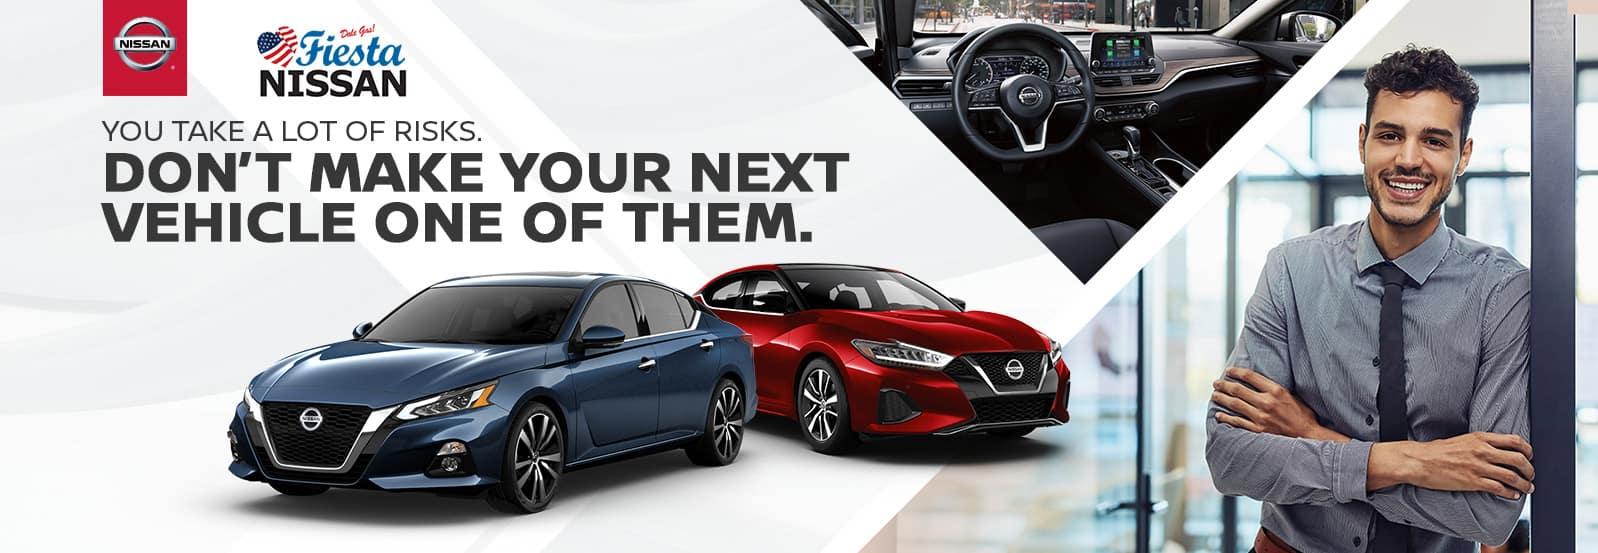 Nissan Models for Self-Starters | Fiesta Nissan | Edinburg, TX